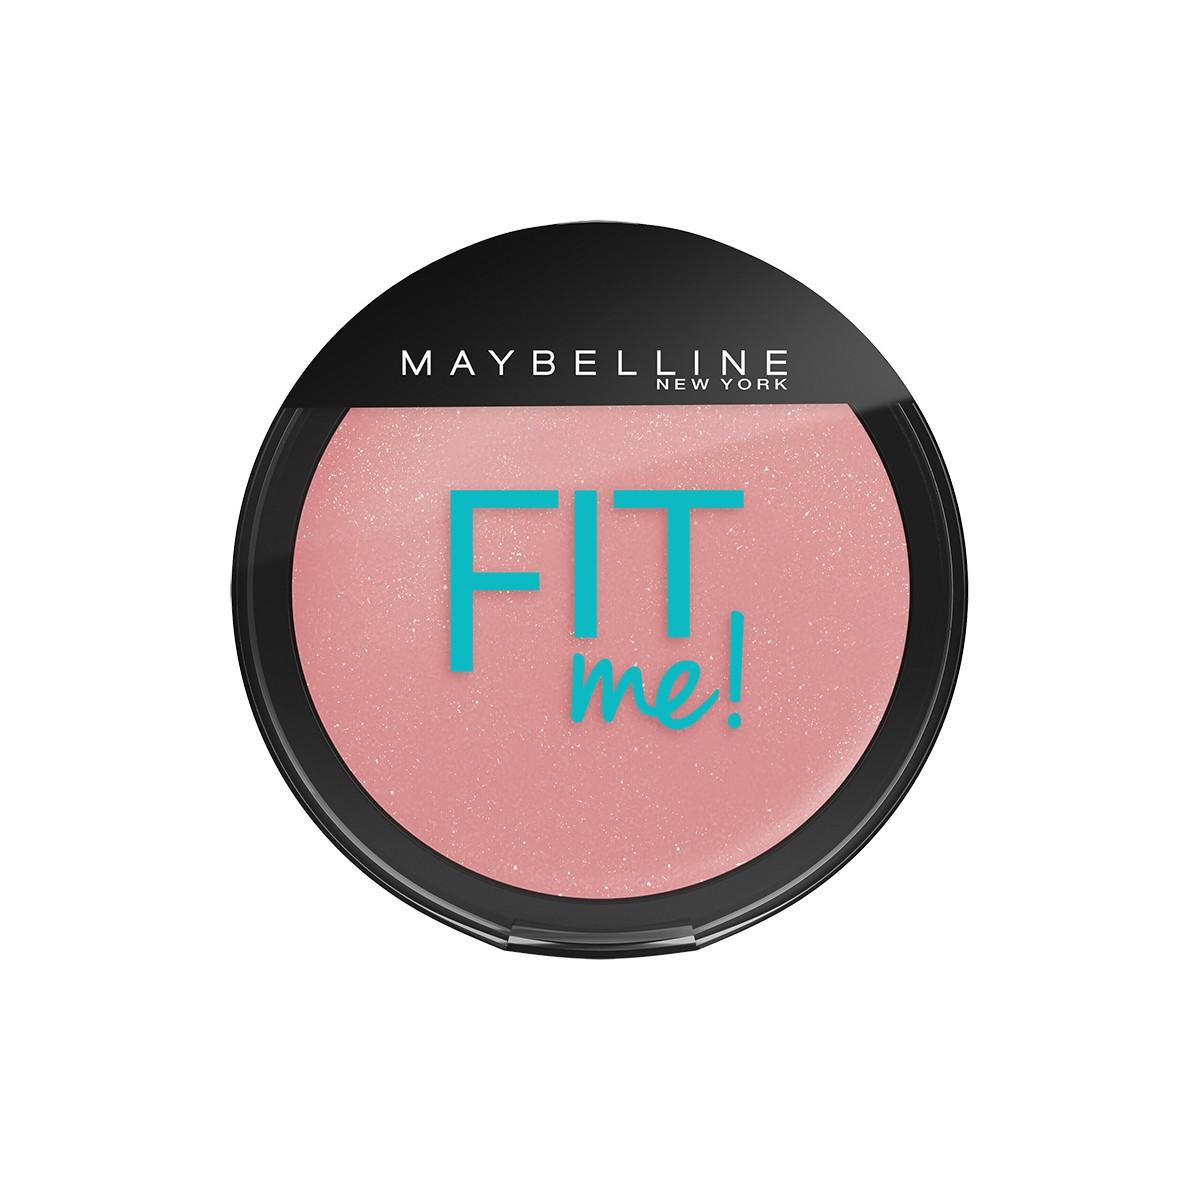 Blush Maybelline Fit Me Nº04 Eu e Eu Mesma Maybelline 1 Unidade - brand